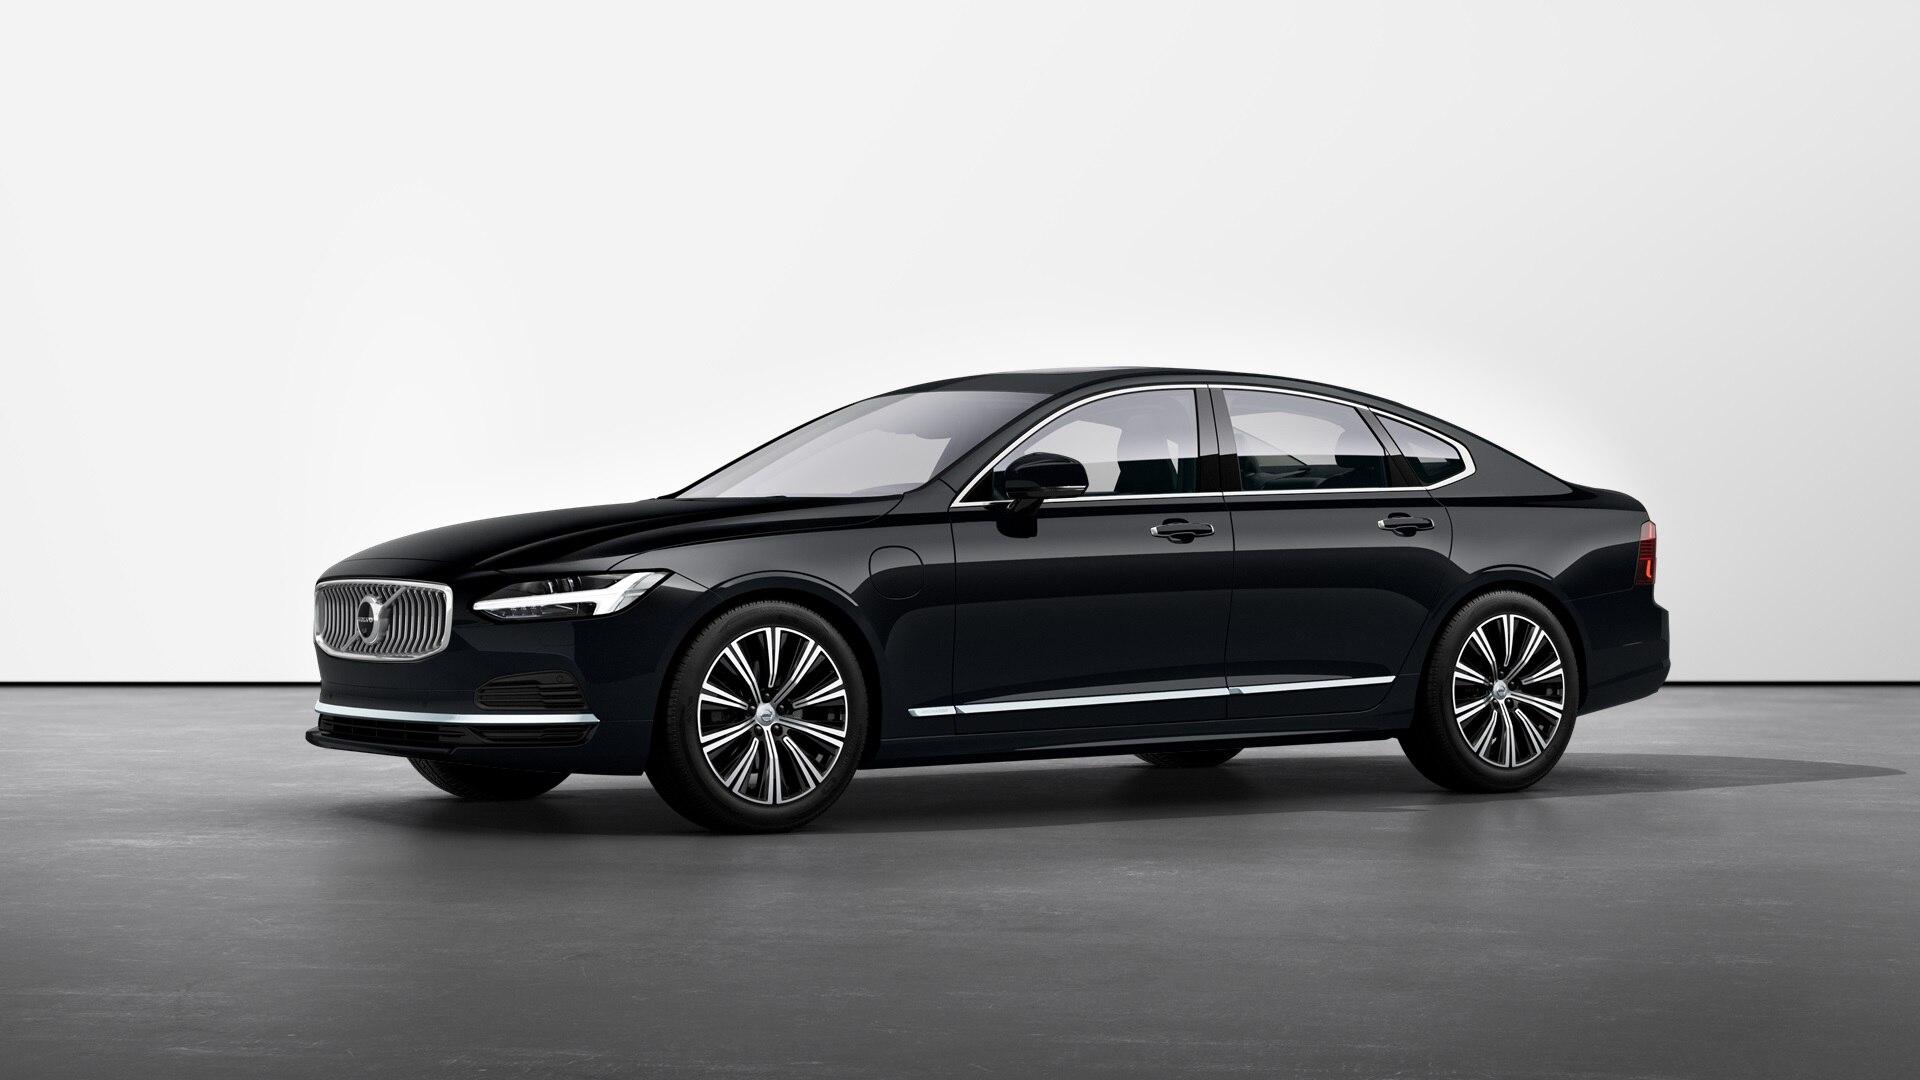 2021 Volvo S90 Recharge Inscription - Onyx Black Metallic